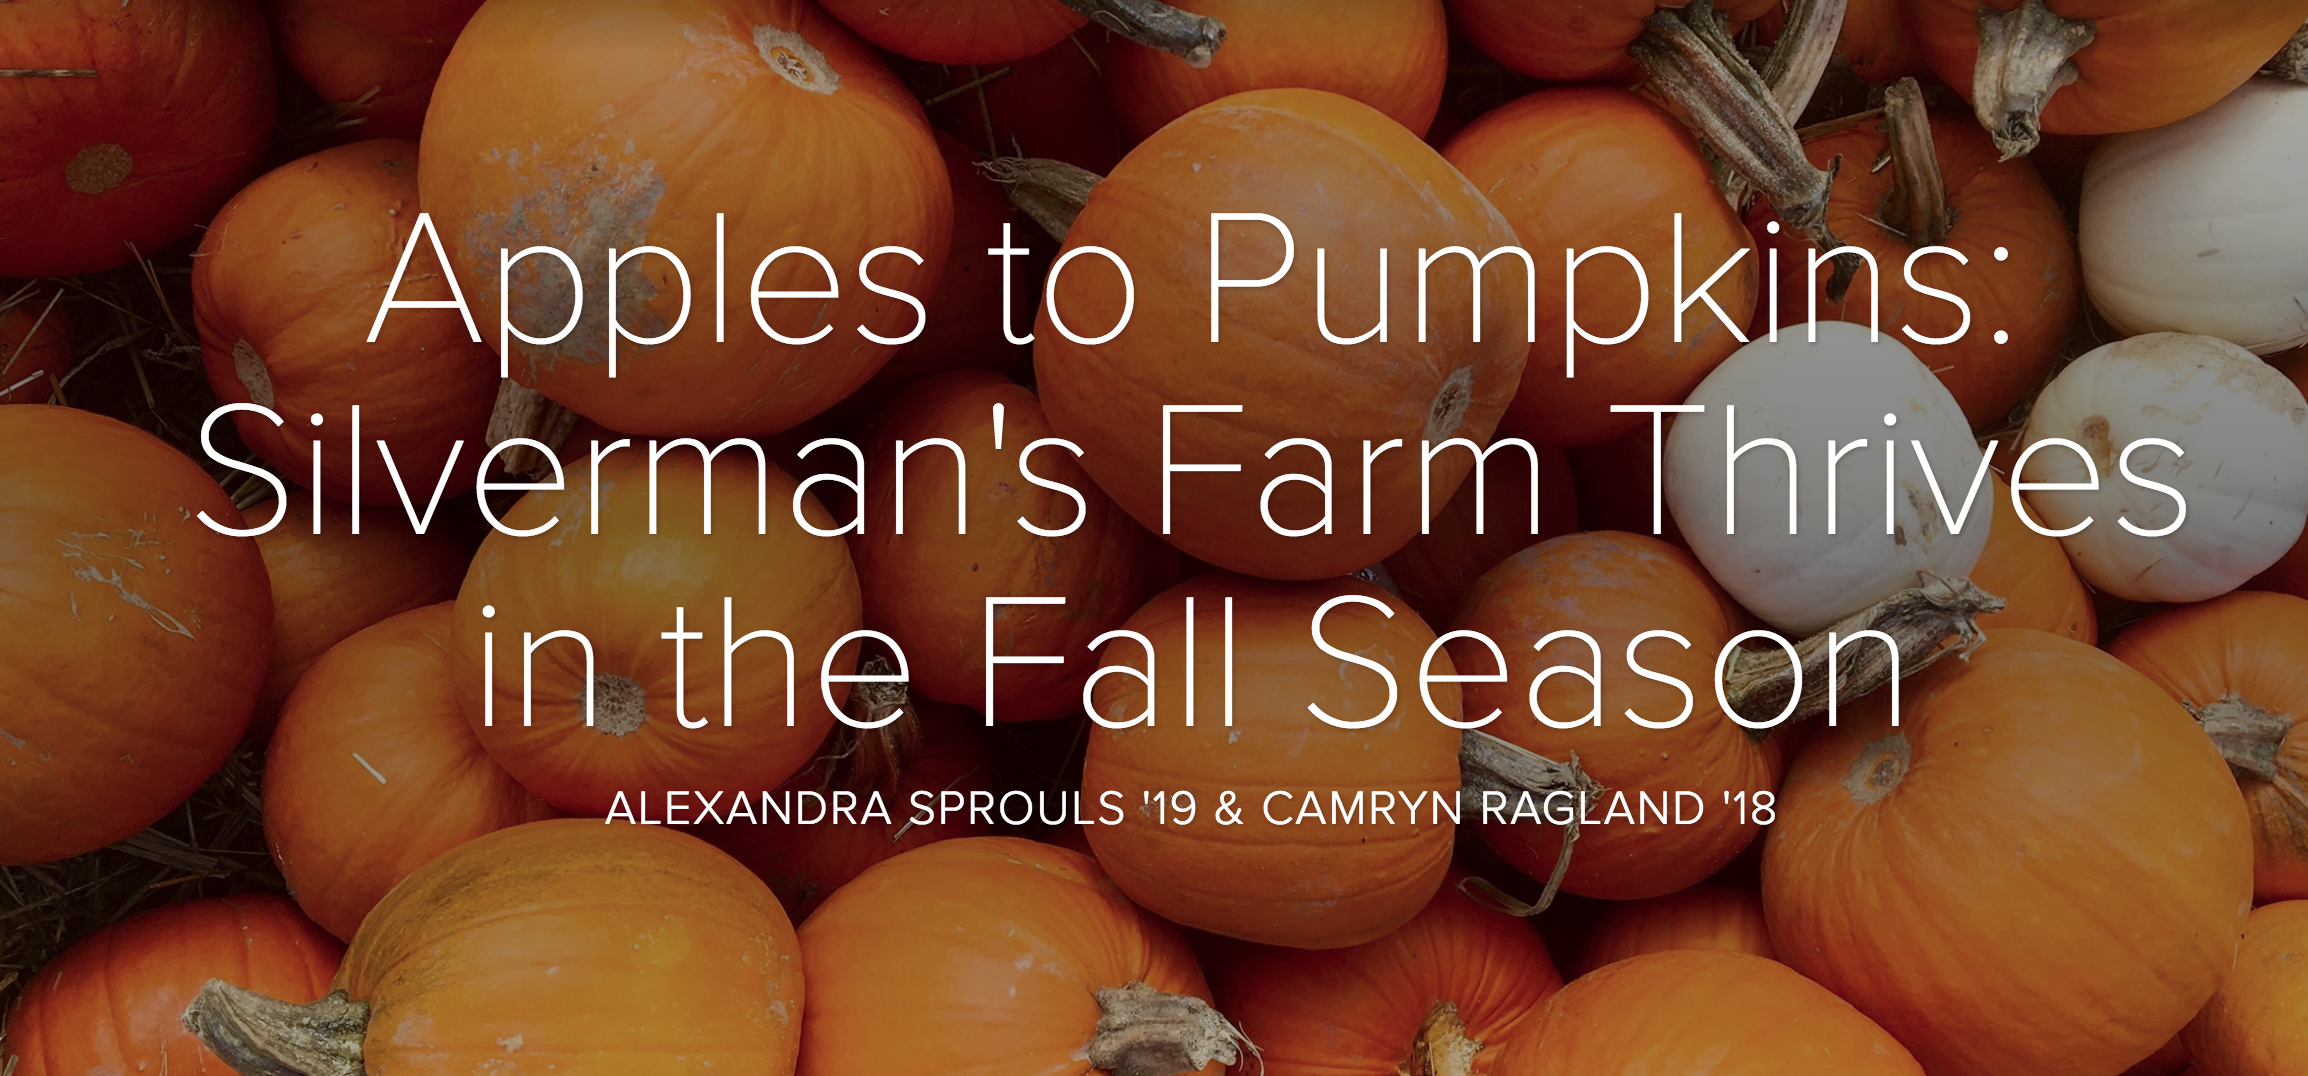 Apples to Pumpkins: Silvermans Farm Thrives in the Fall Season